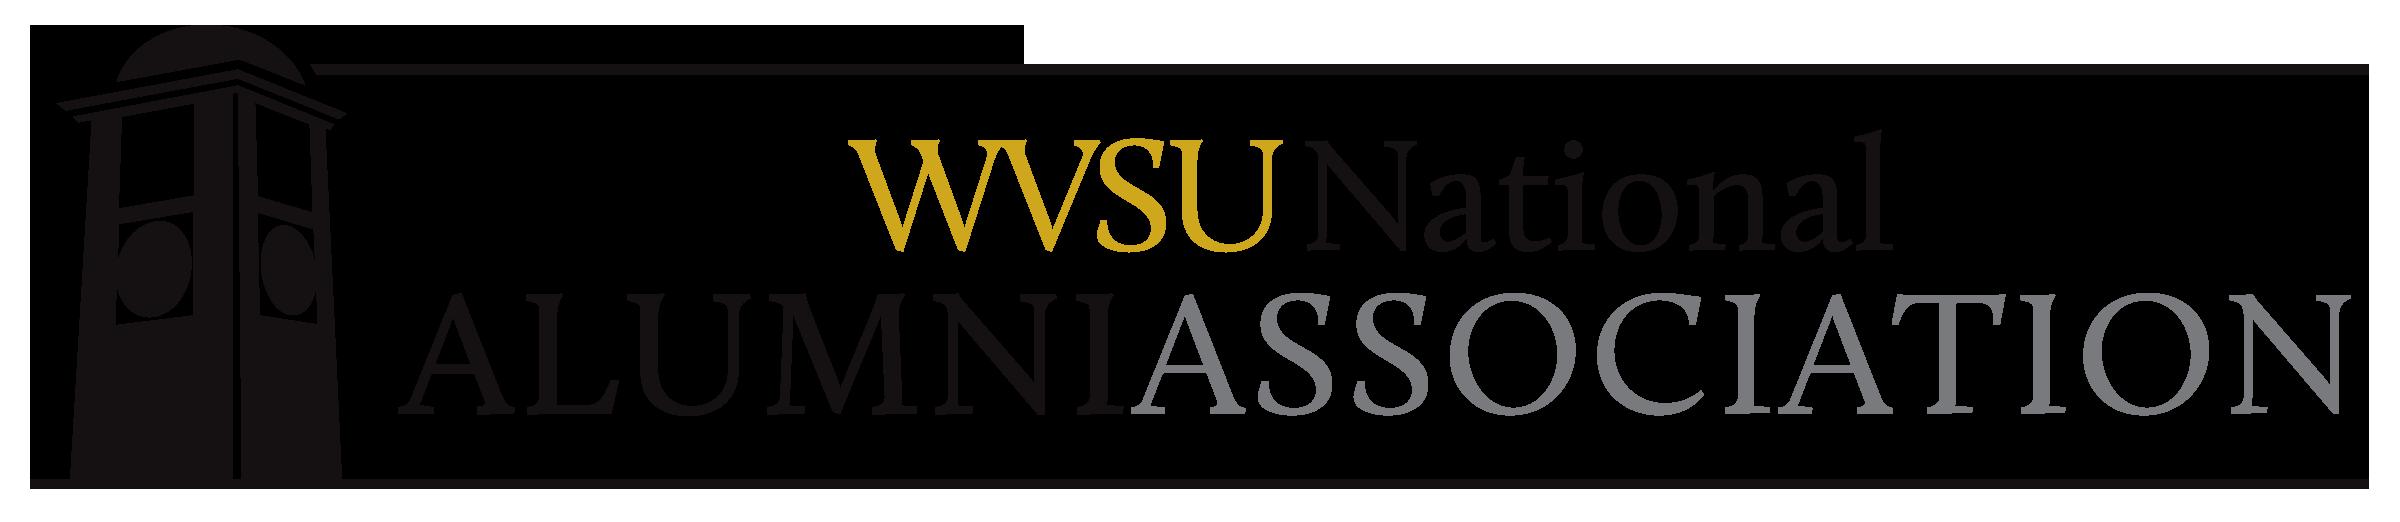 WVSUNAA logo